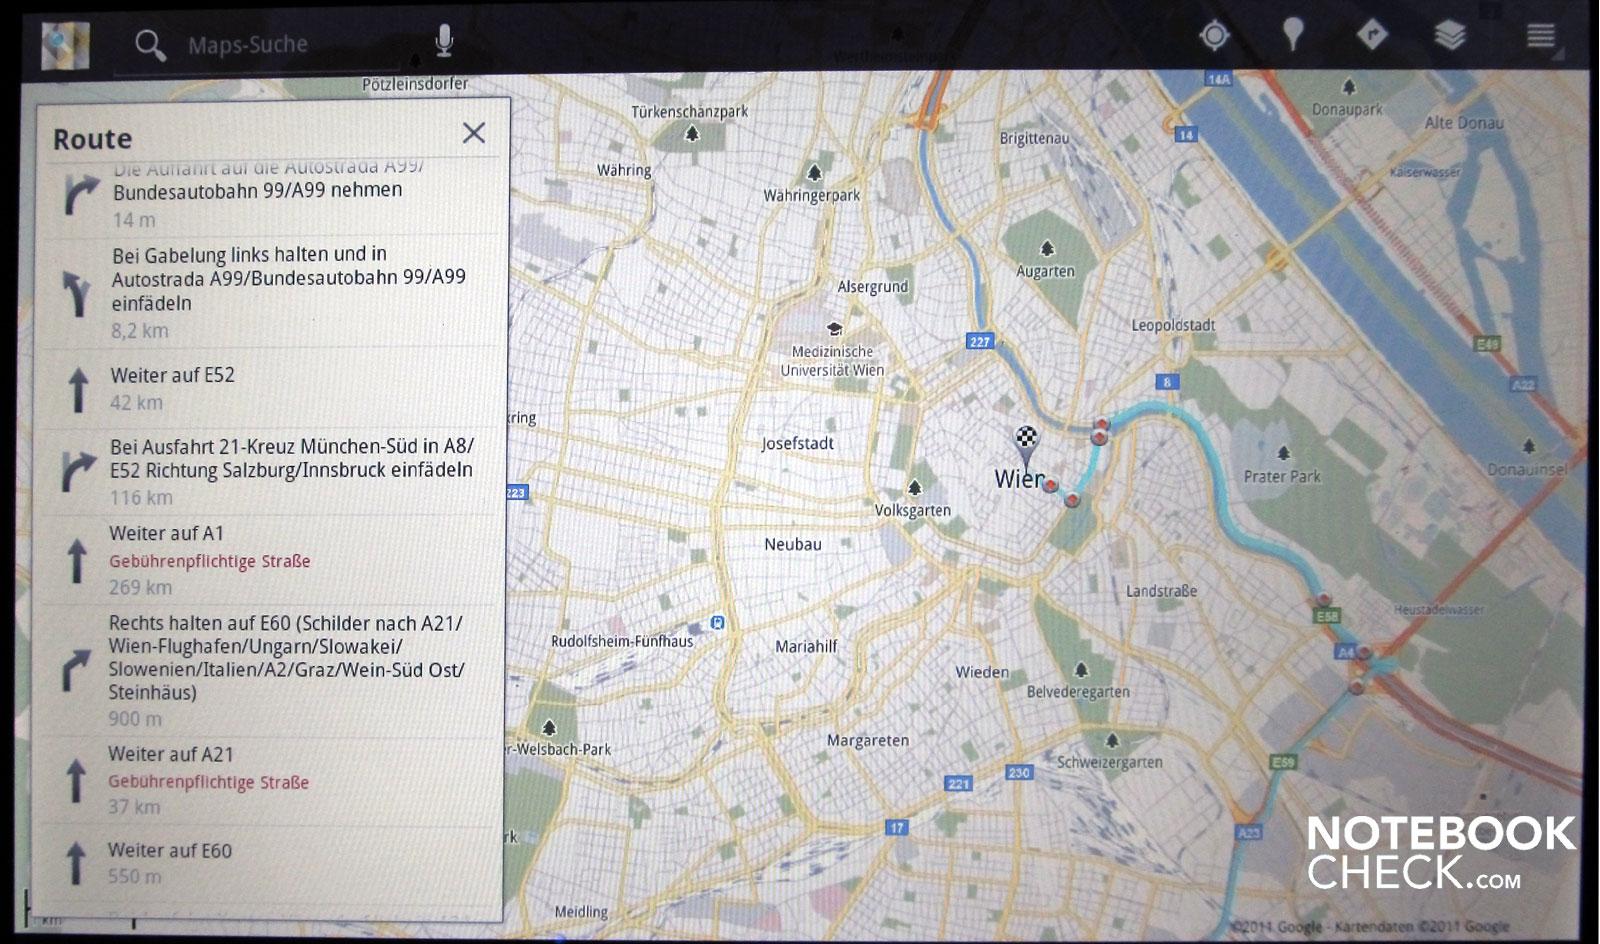 test motorola xoom wifi umts tablet mid notebookcheck. Black Bedroom Furniture Sets. Home Design Ideas